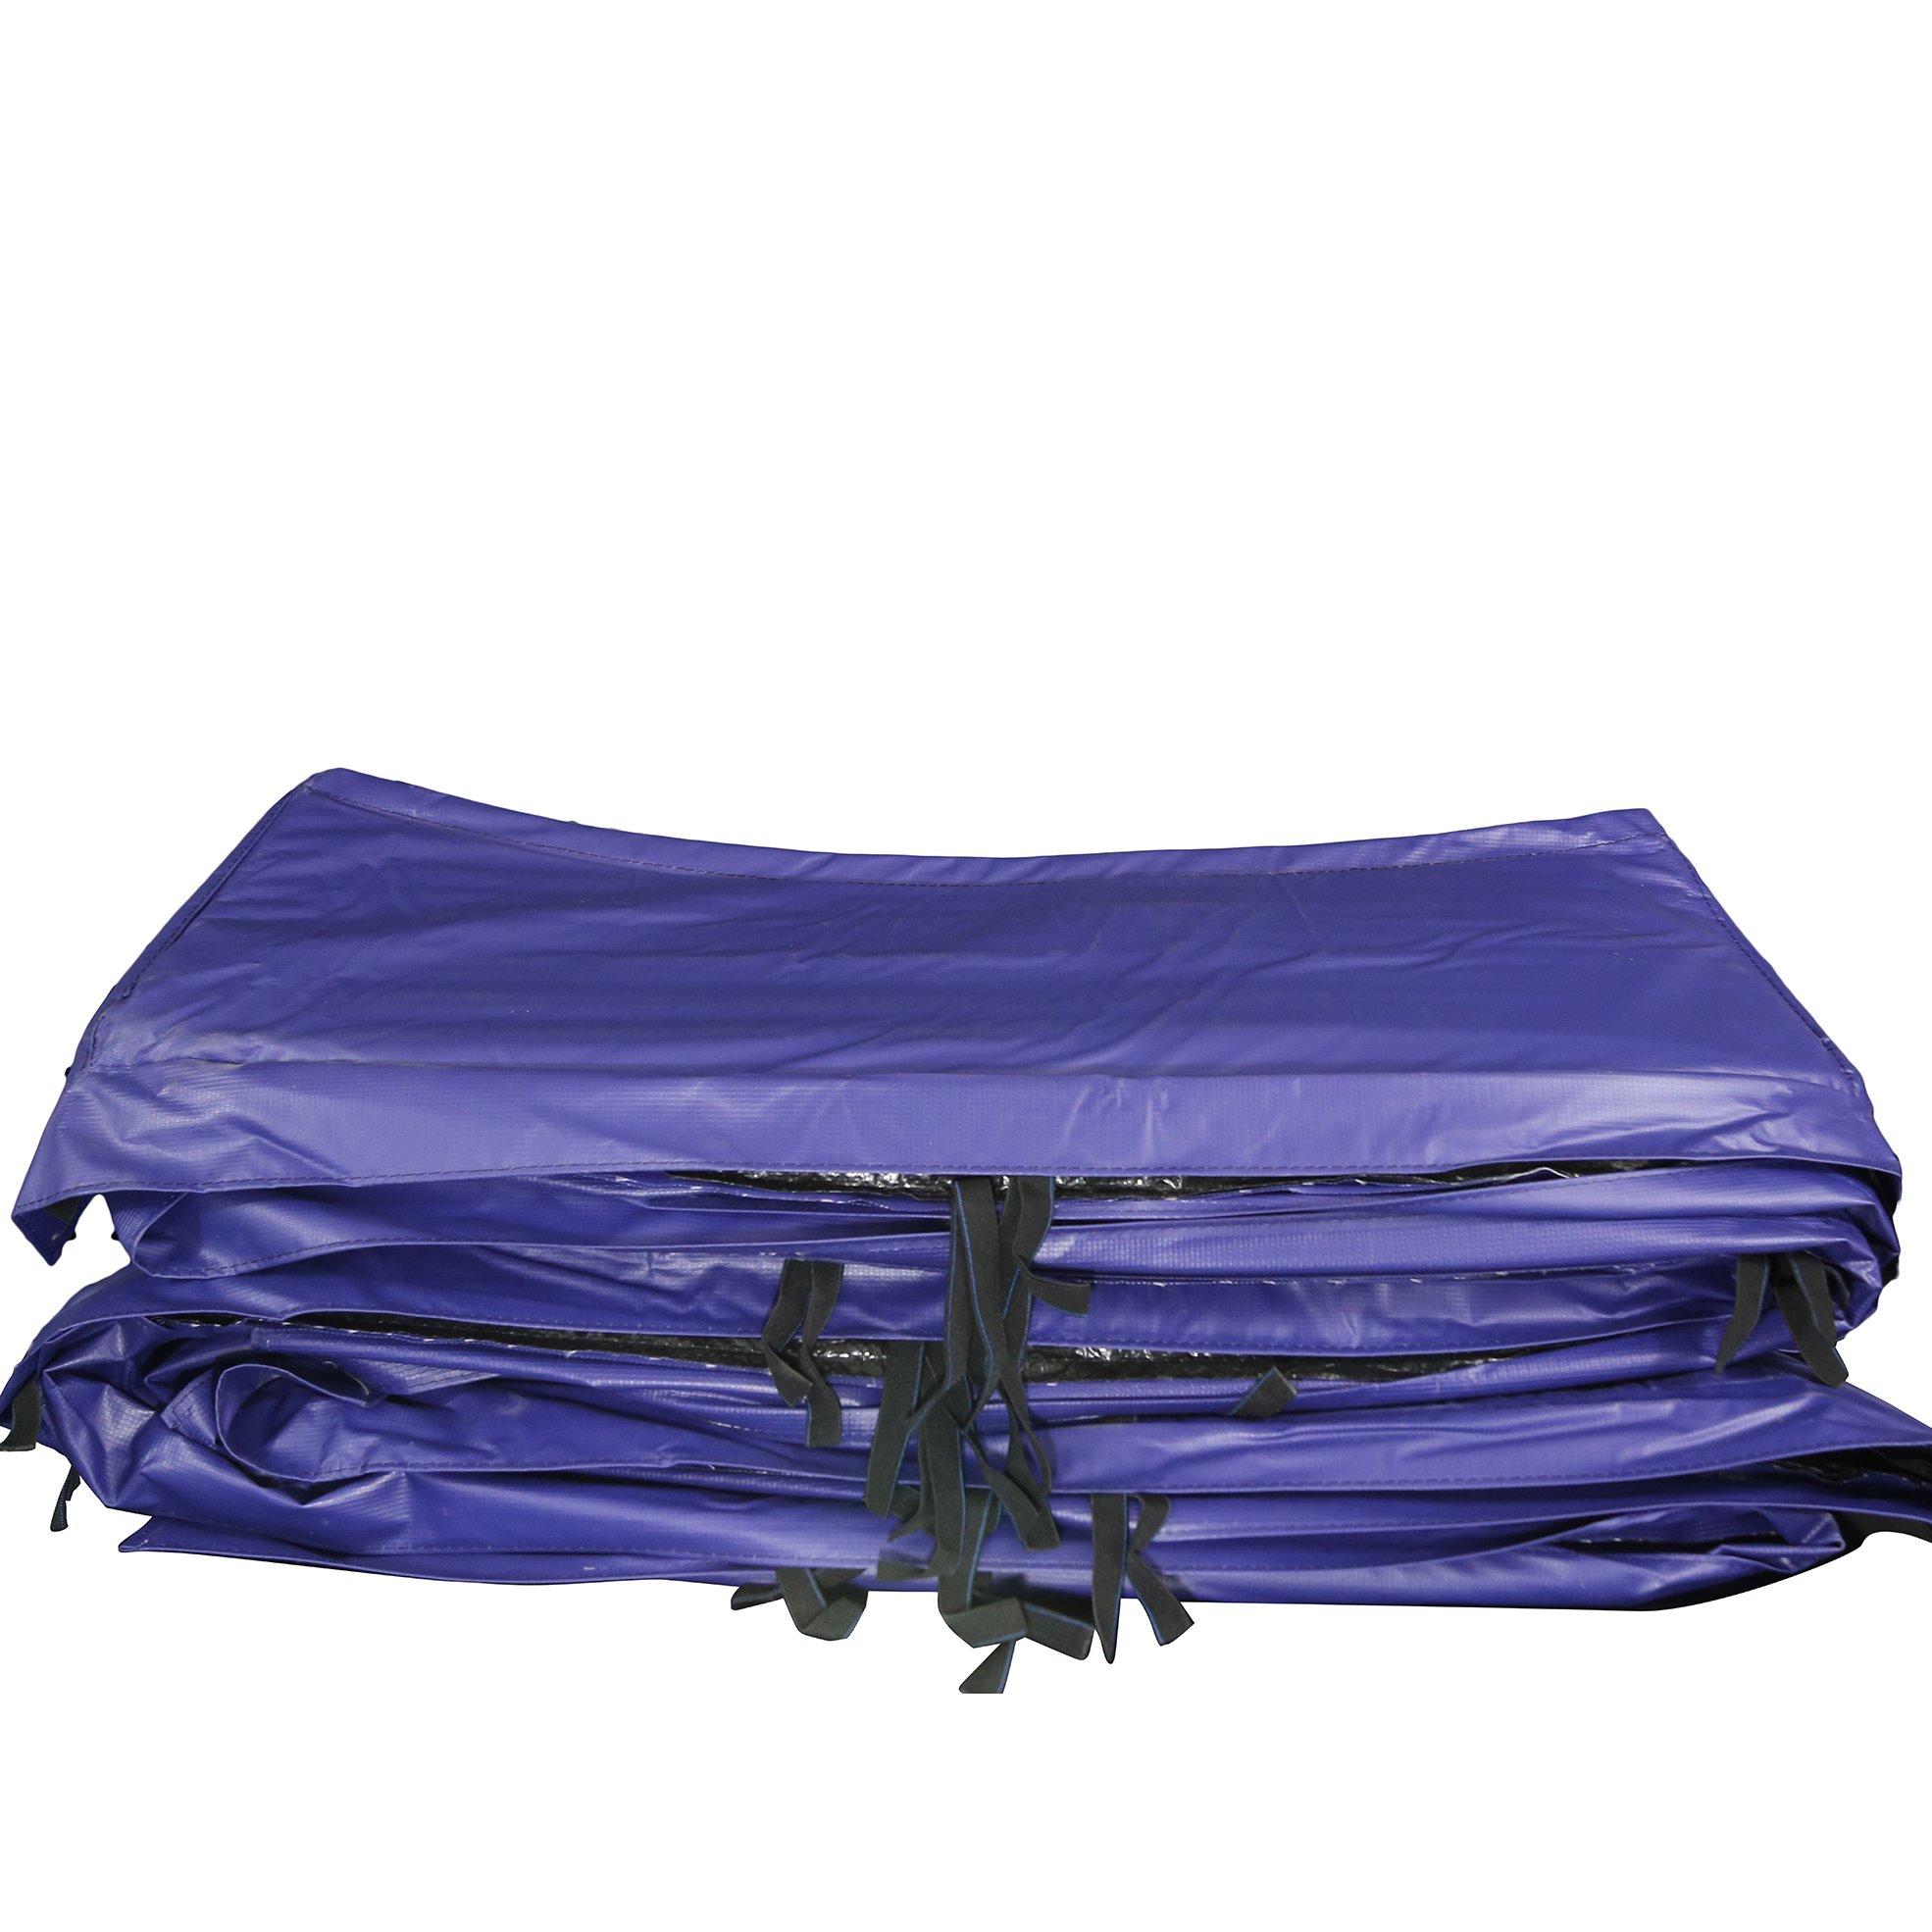 Skywalker Trampolines Round Spring Pad, 12', Blue by Skywalker Trampolines (Image #1)